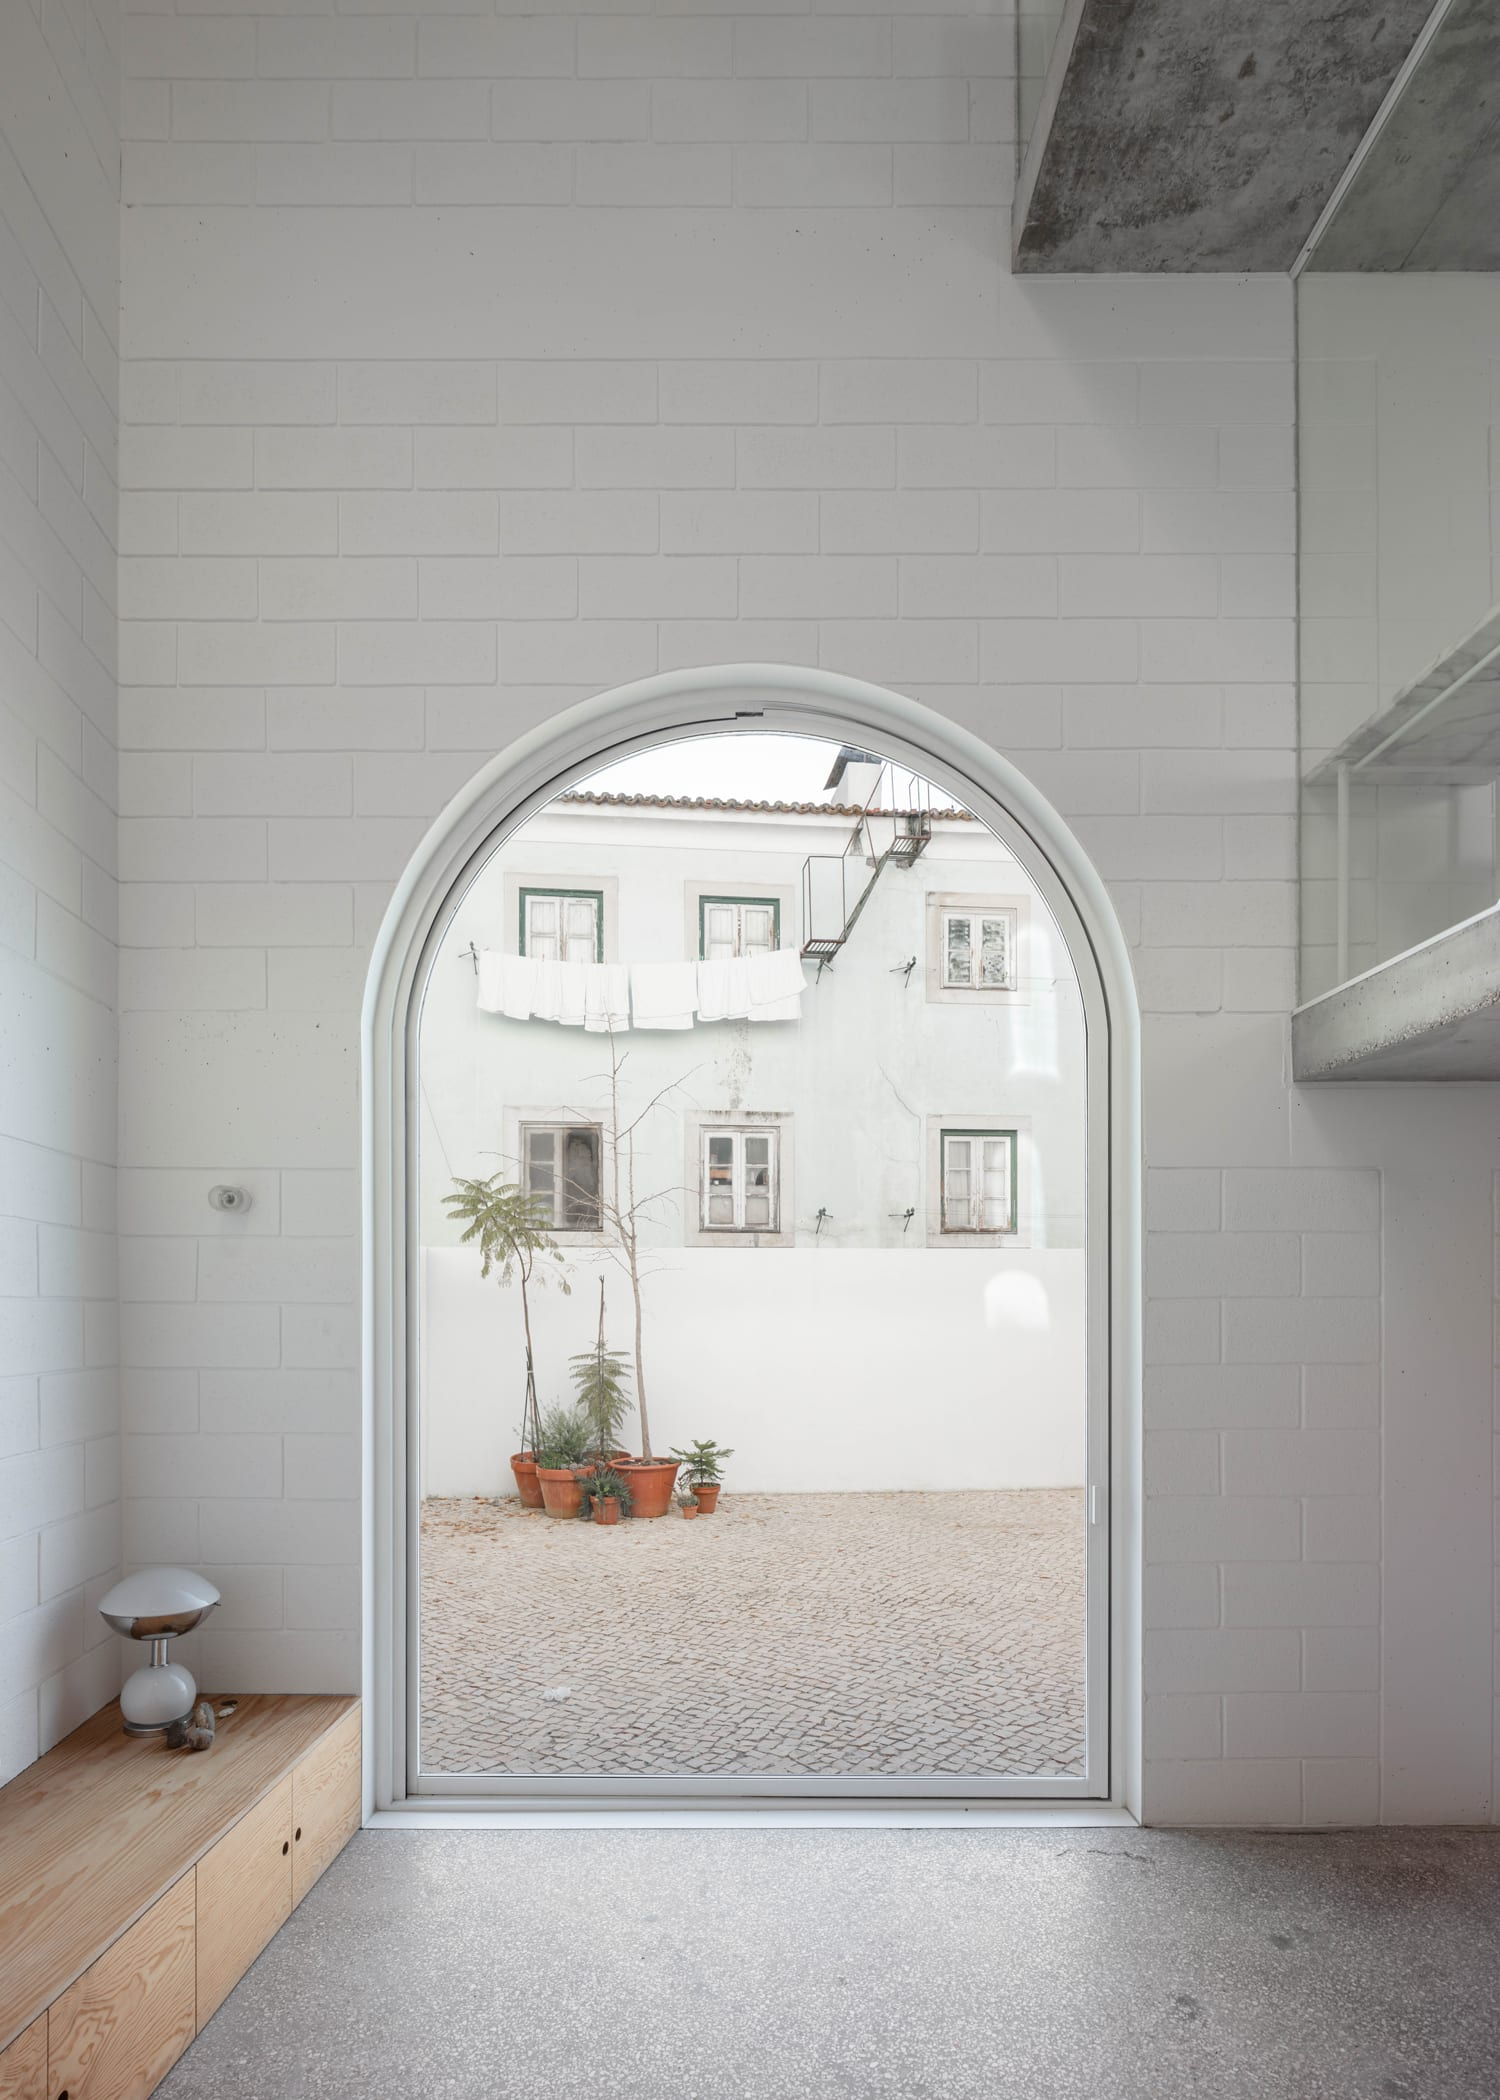 Dodged House in Lisbon, Portugal by Leopold Banchini + Daniel Zamarbide | Yellowtrace